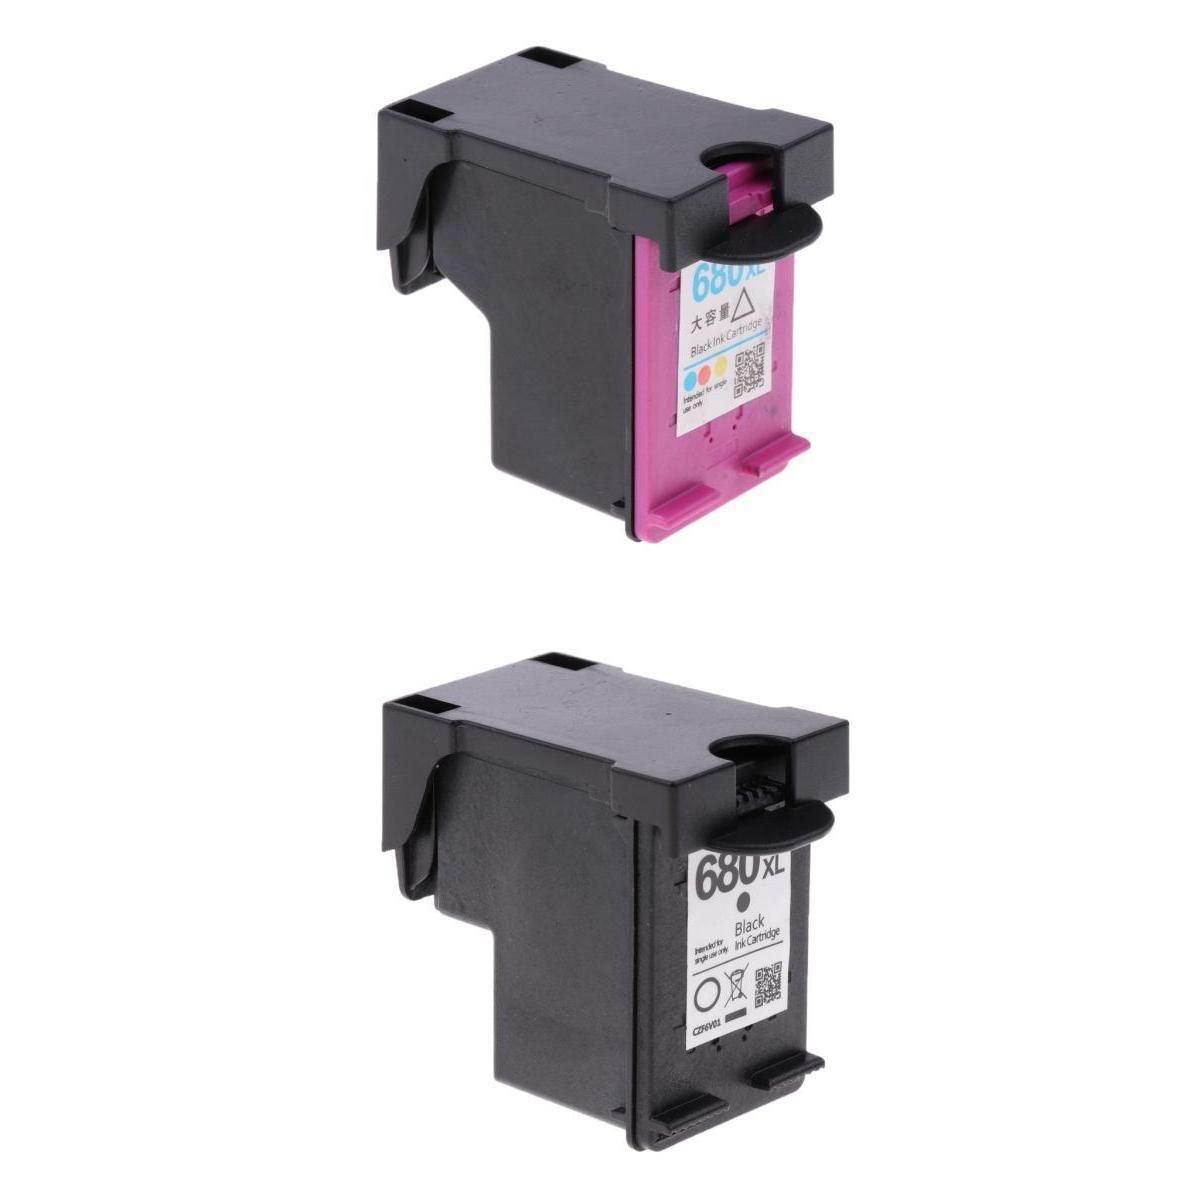 Almencla 2 unds Cartucho de Tinta de Impresora 3D para HP 3838 ...